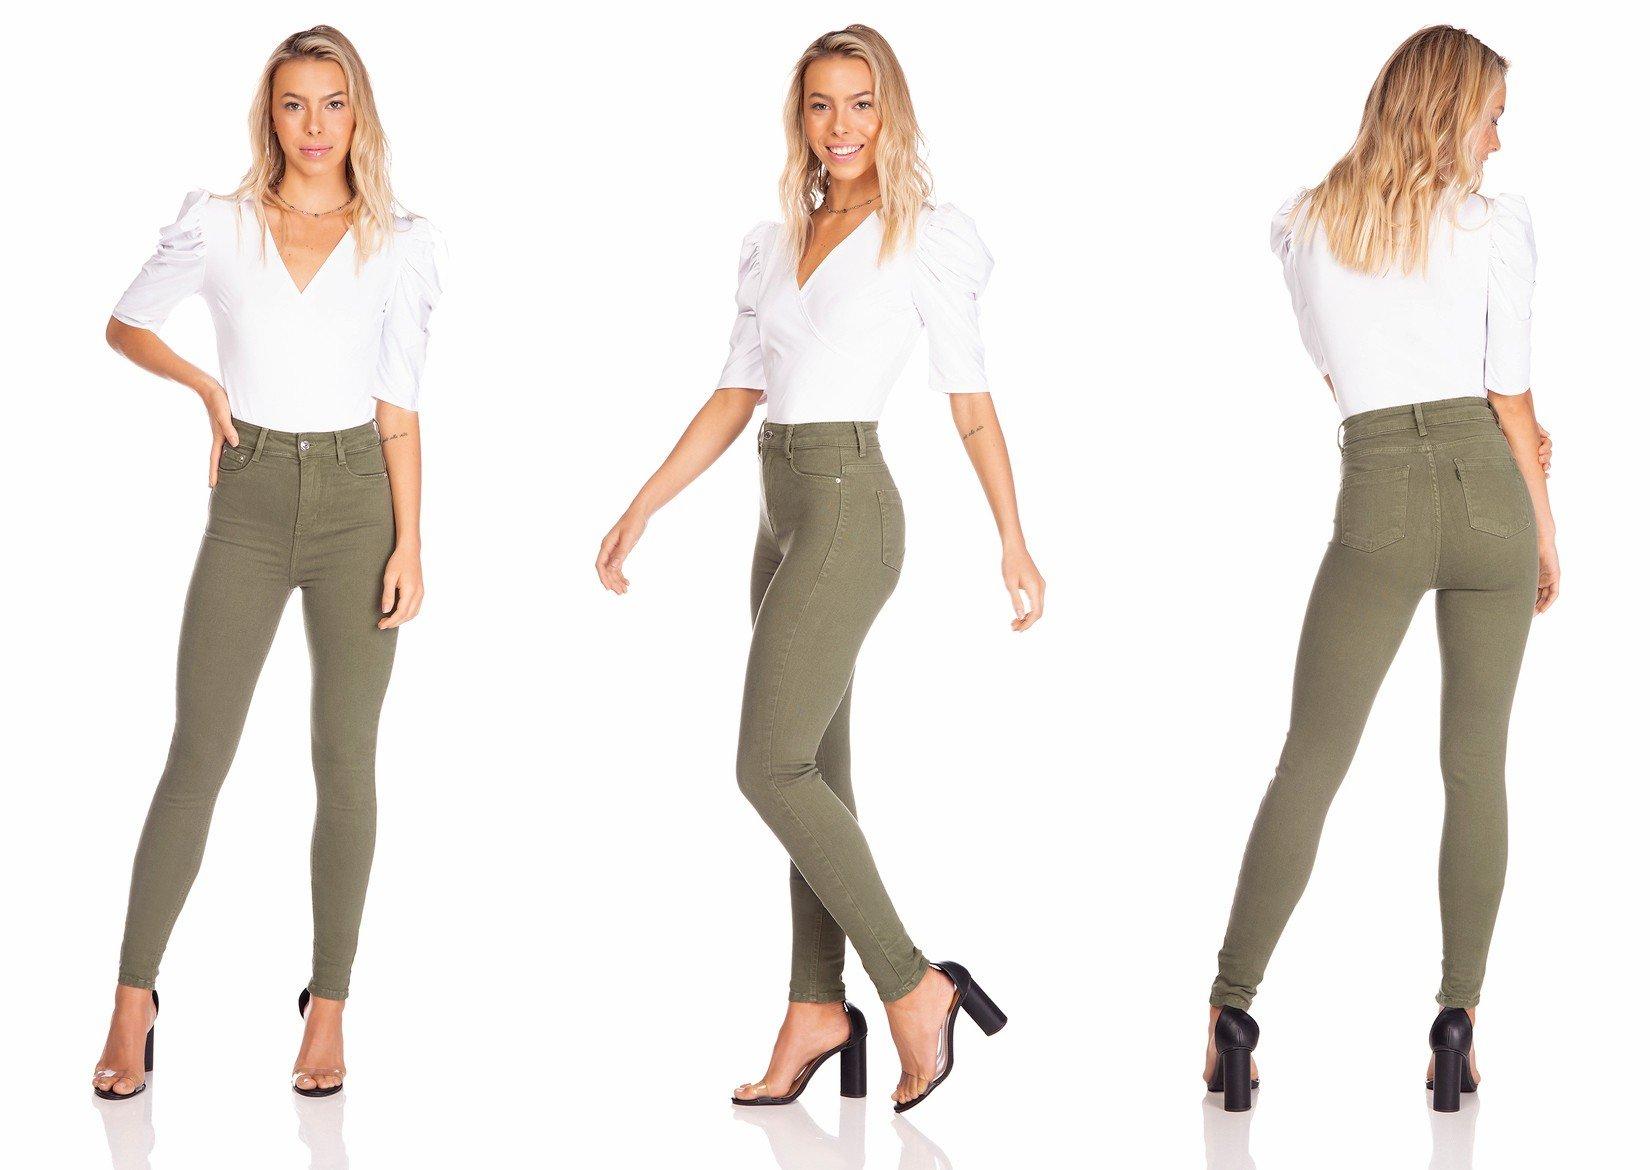 dz2528 13 calca jeans feminina skinny hot pants colorida crocodilo denim zero tripla